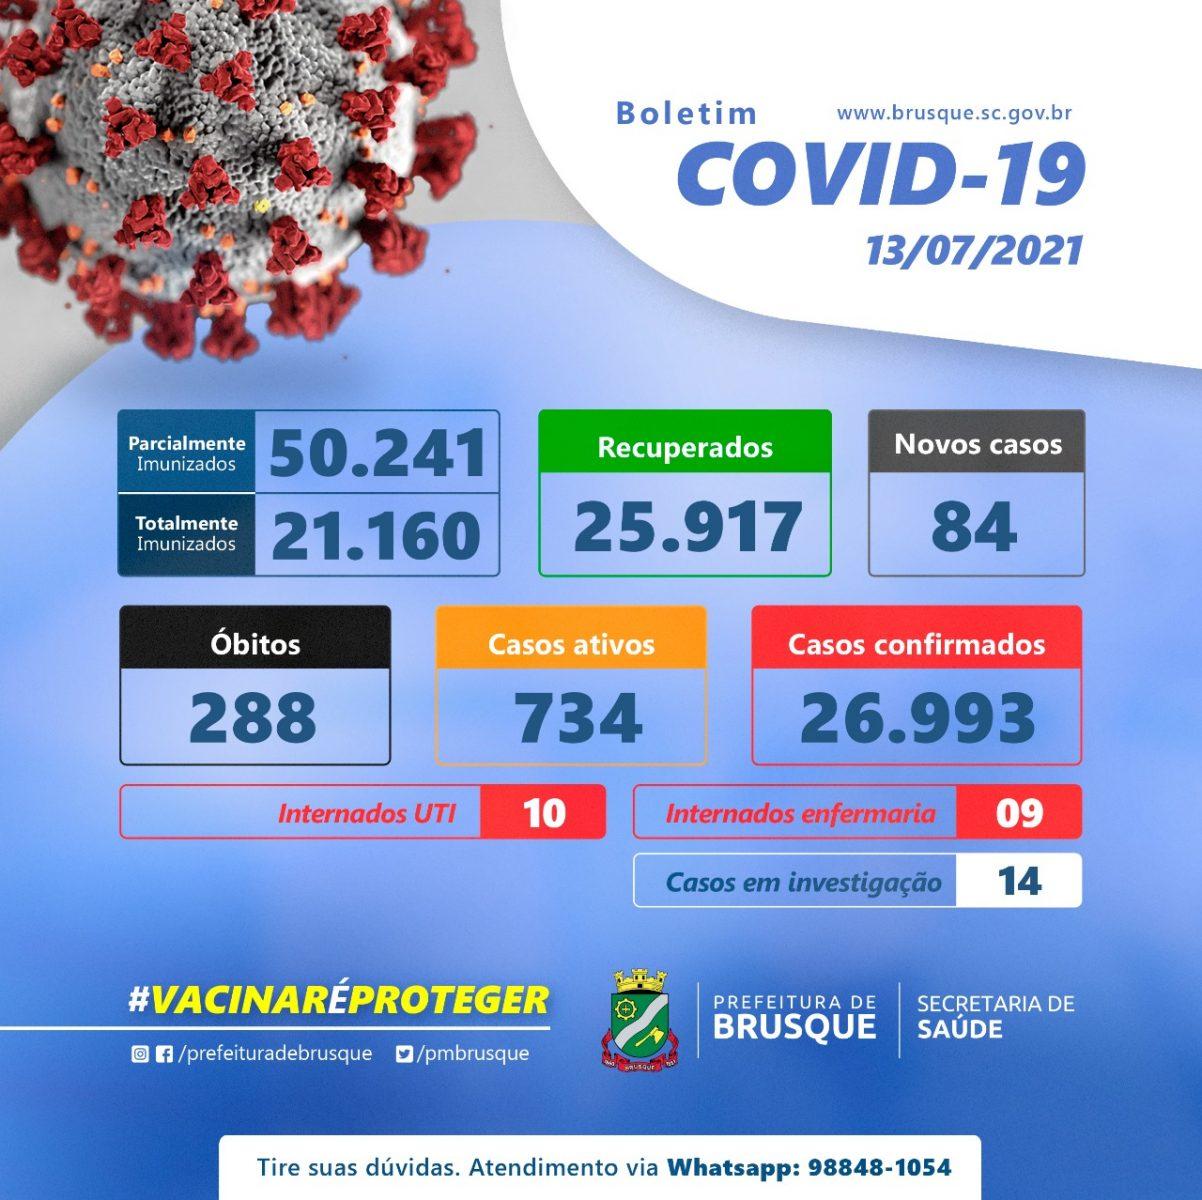 Covid-19: Confira o boletim epidemiológico desta terça-feira (13)